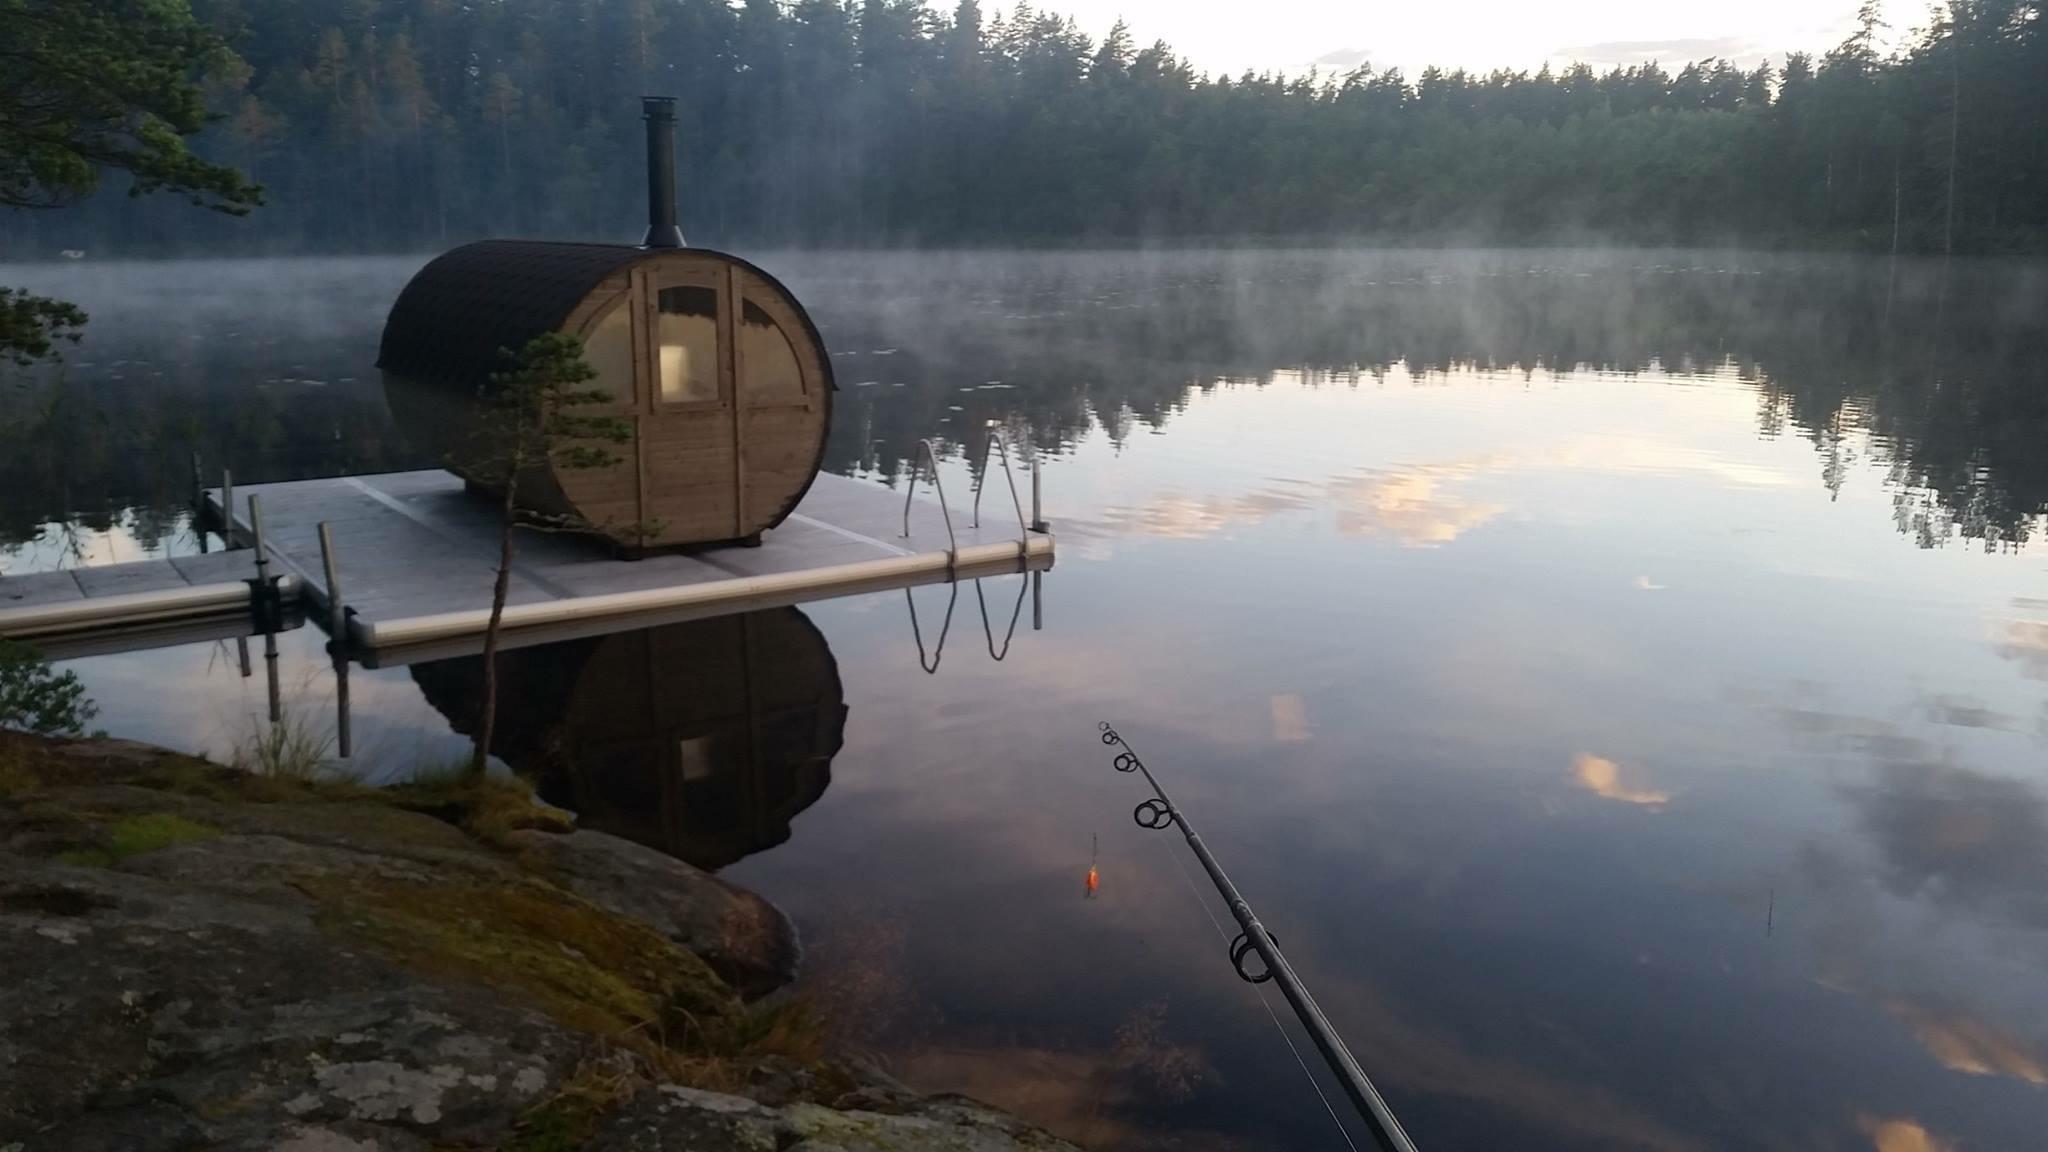 Sauna at Kolarbyn Eco-lodge. Picture taken by Lennart Trollvad.